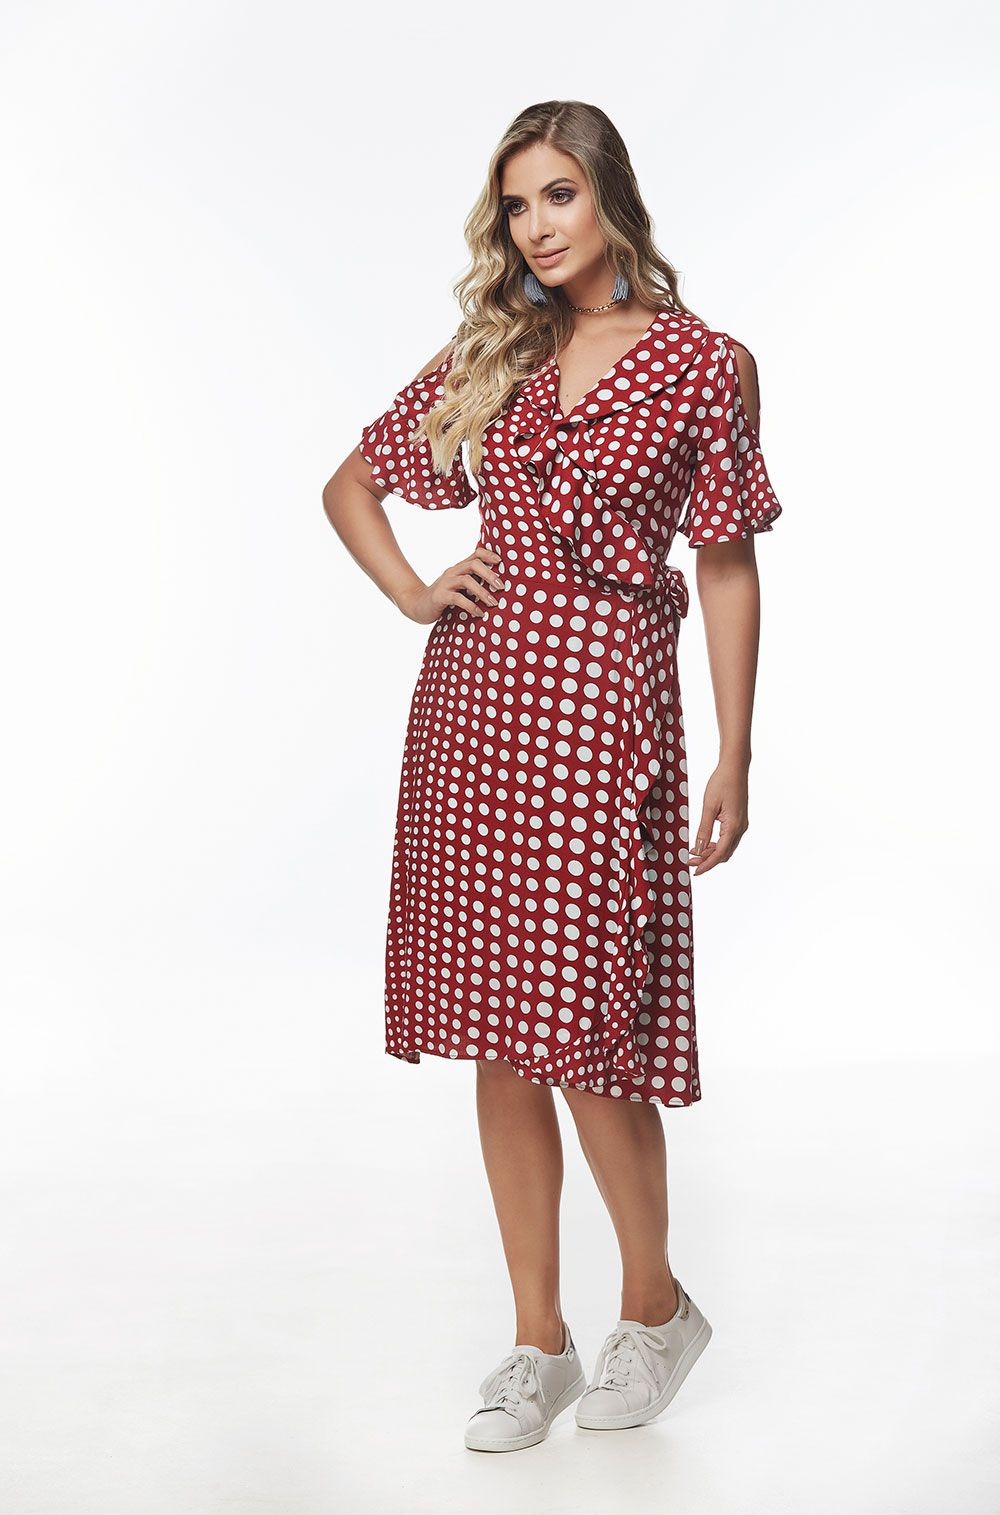 b020c36b94 Vestido Chanel Poá Vermelho - VANKOKE - Moda Feminina - Vestidos ...